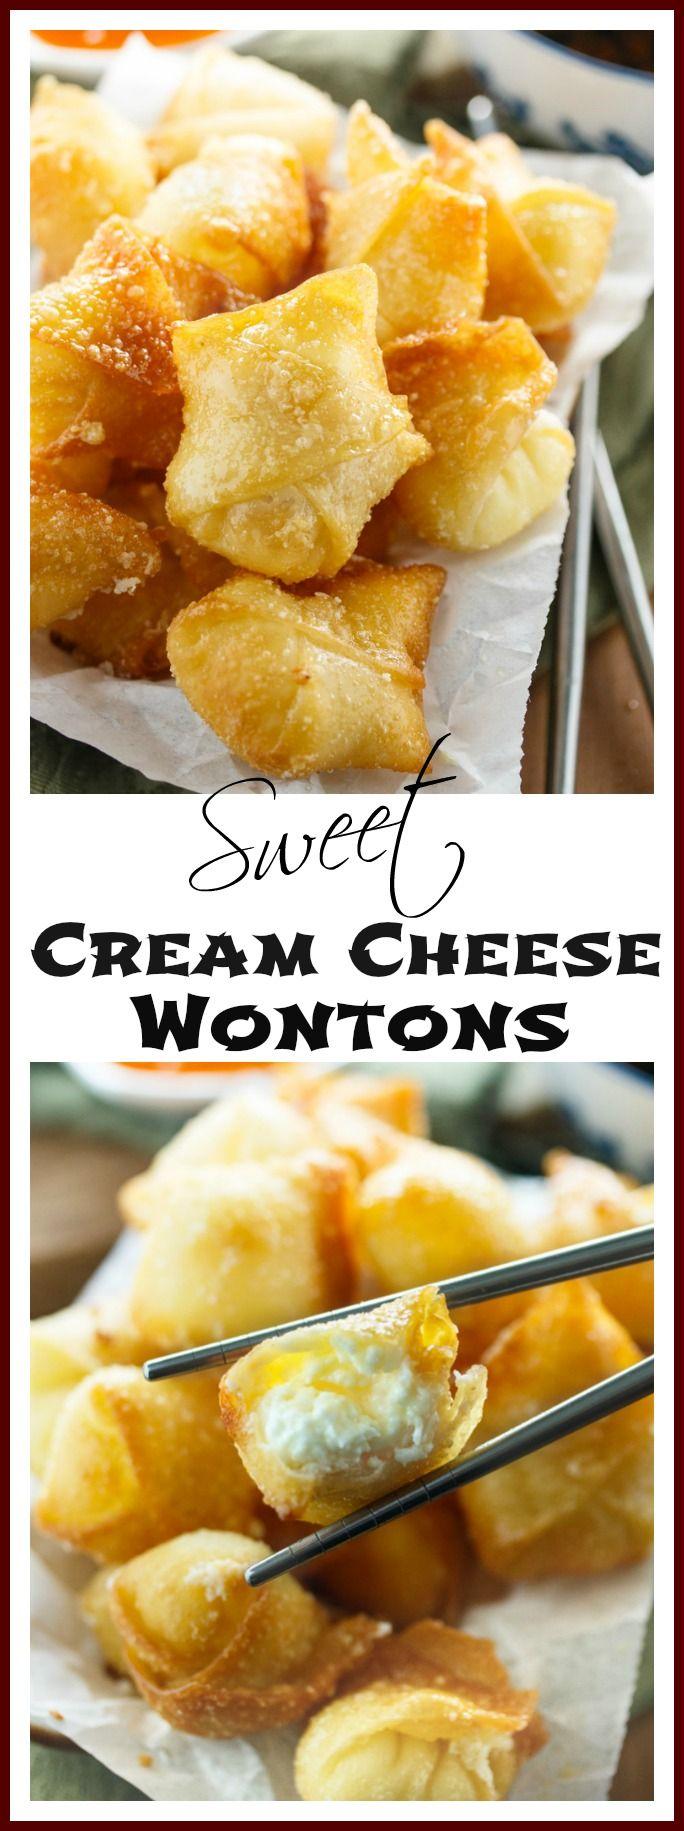 Sweet Cream Cheese WontonsElizabeth Rutkowski